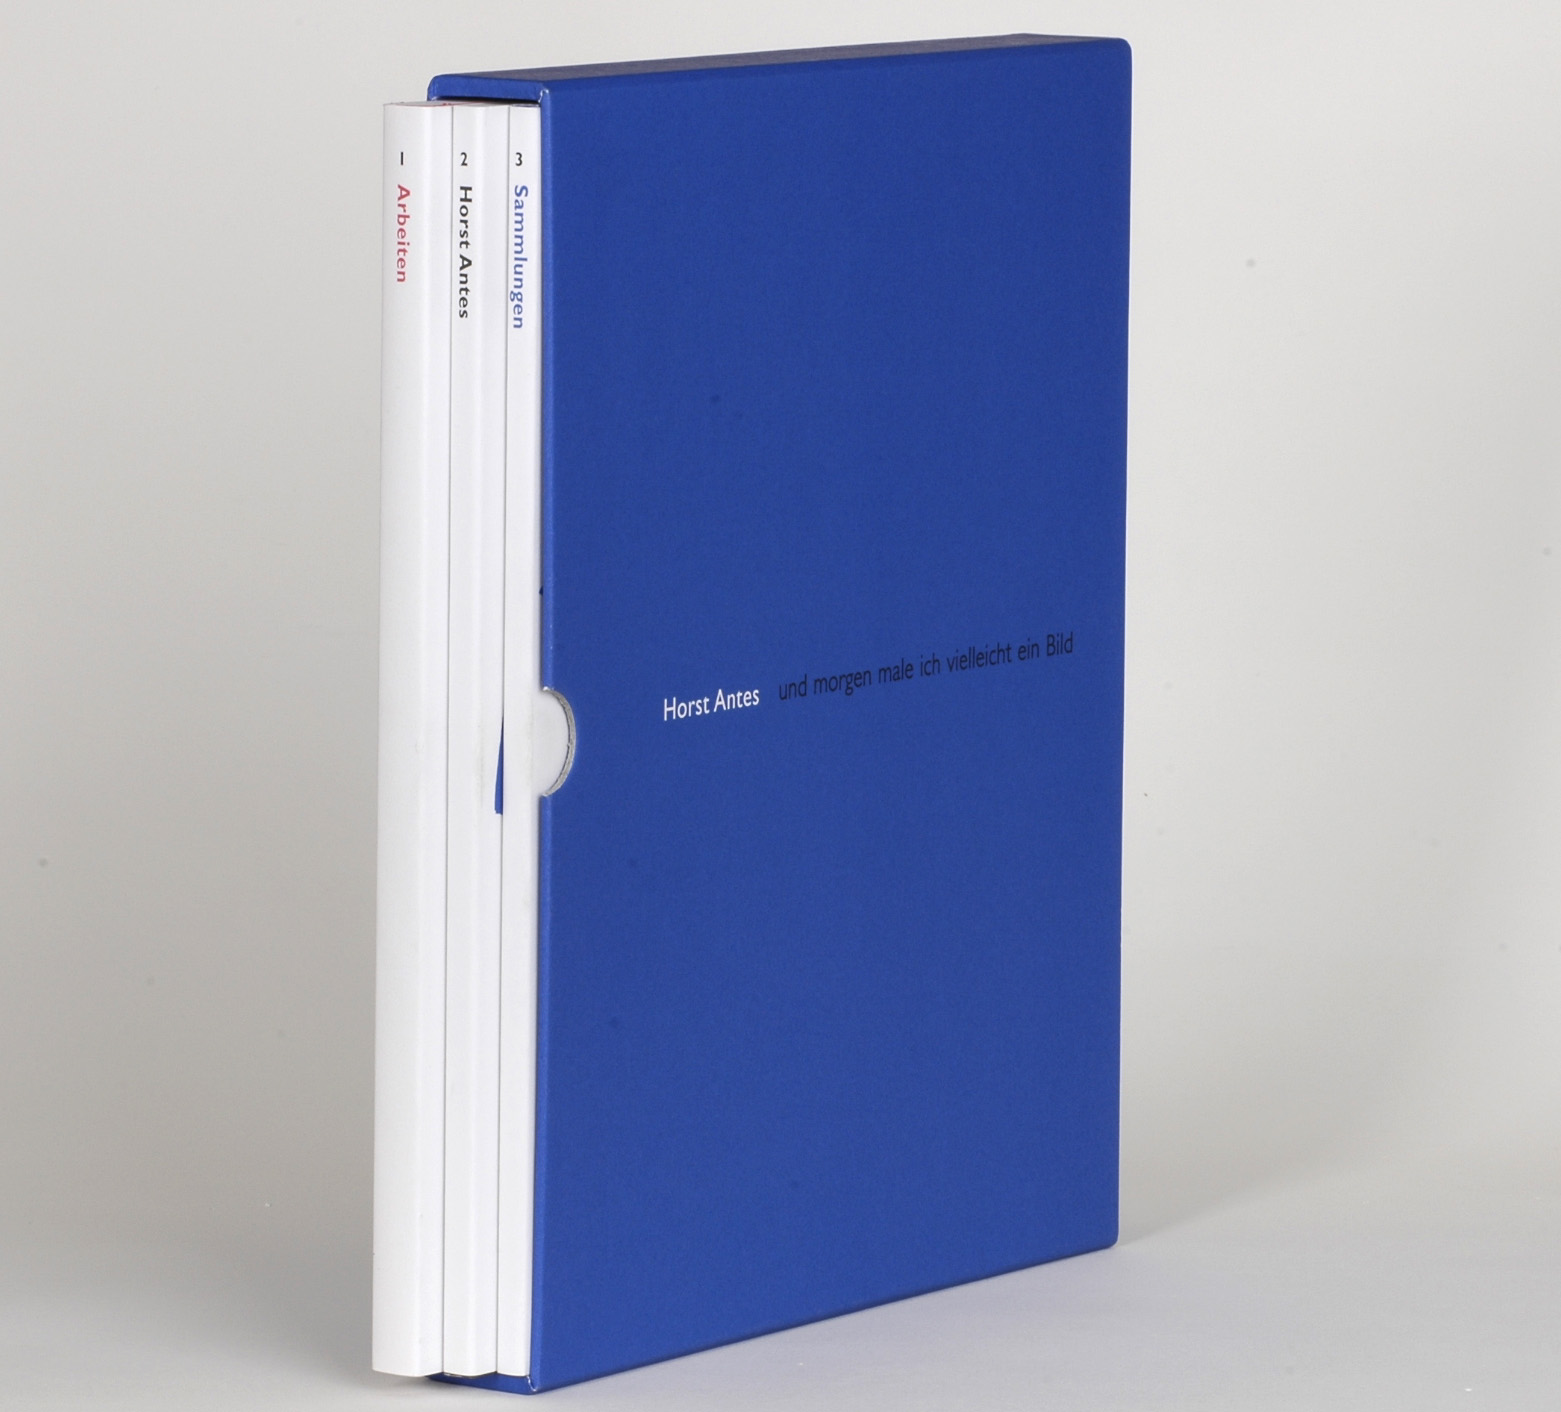 Horst Antes - Arbeiten, Sammlung, Texte